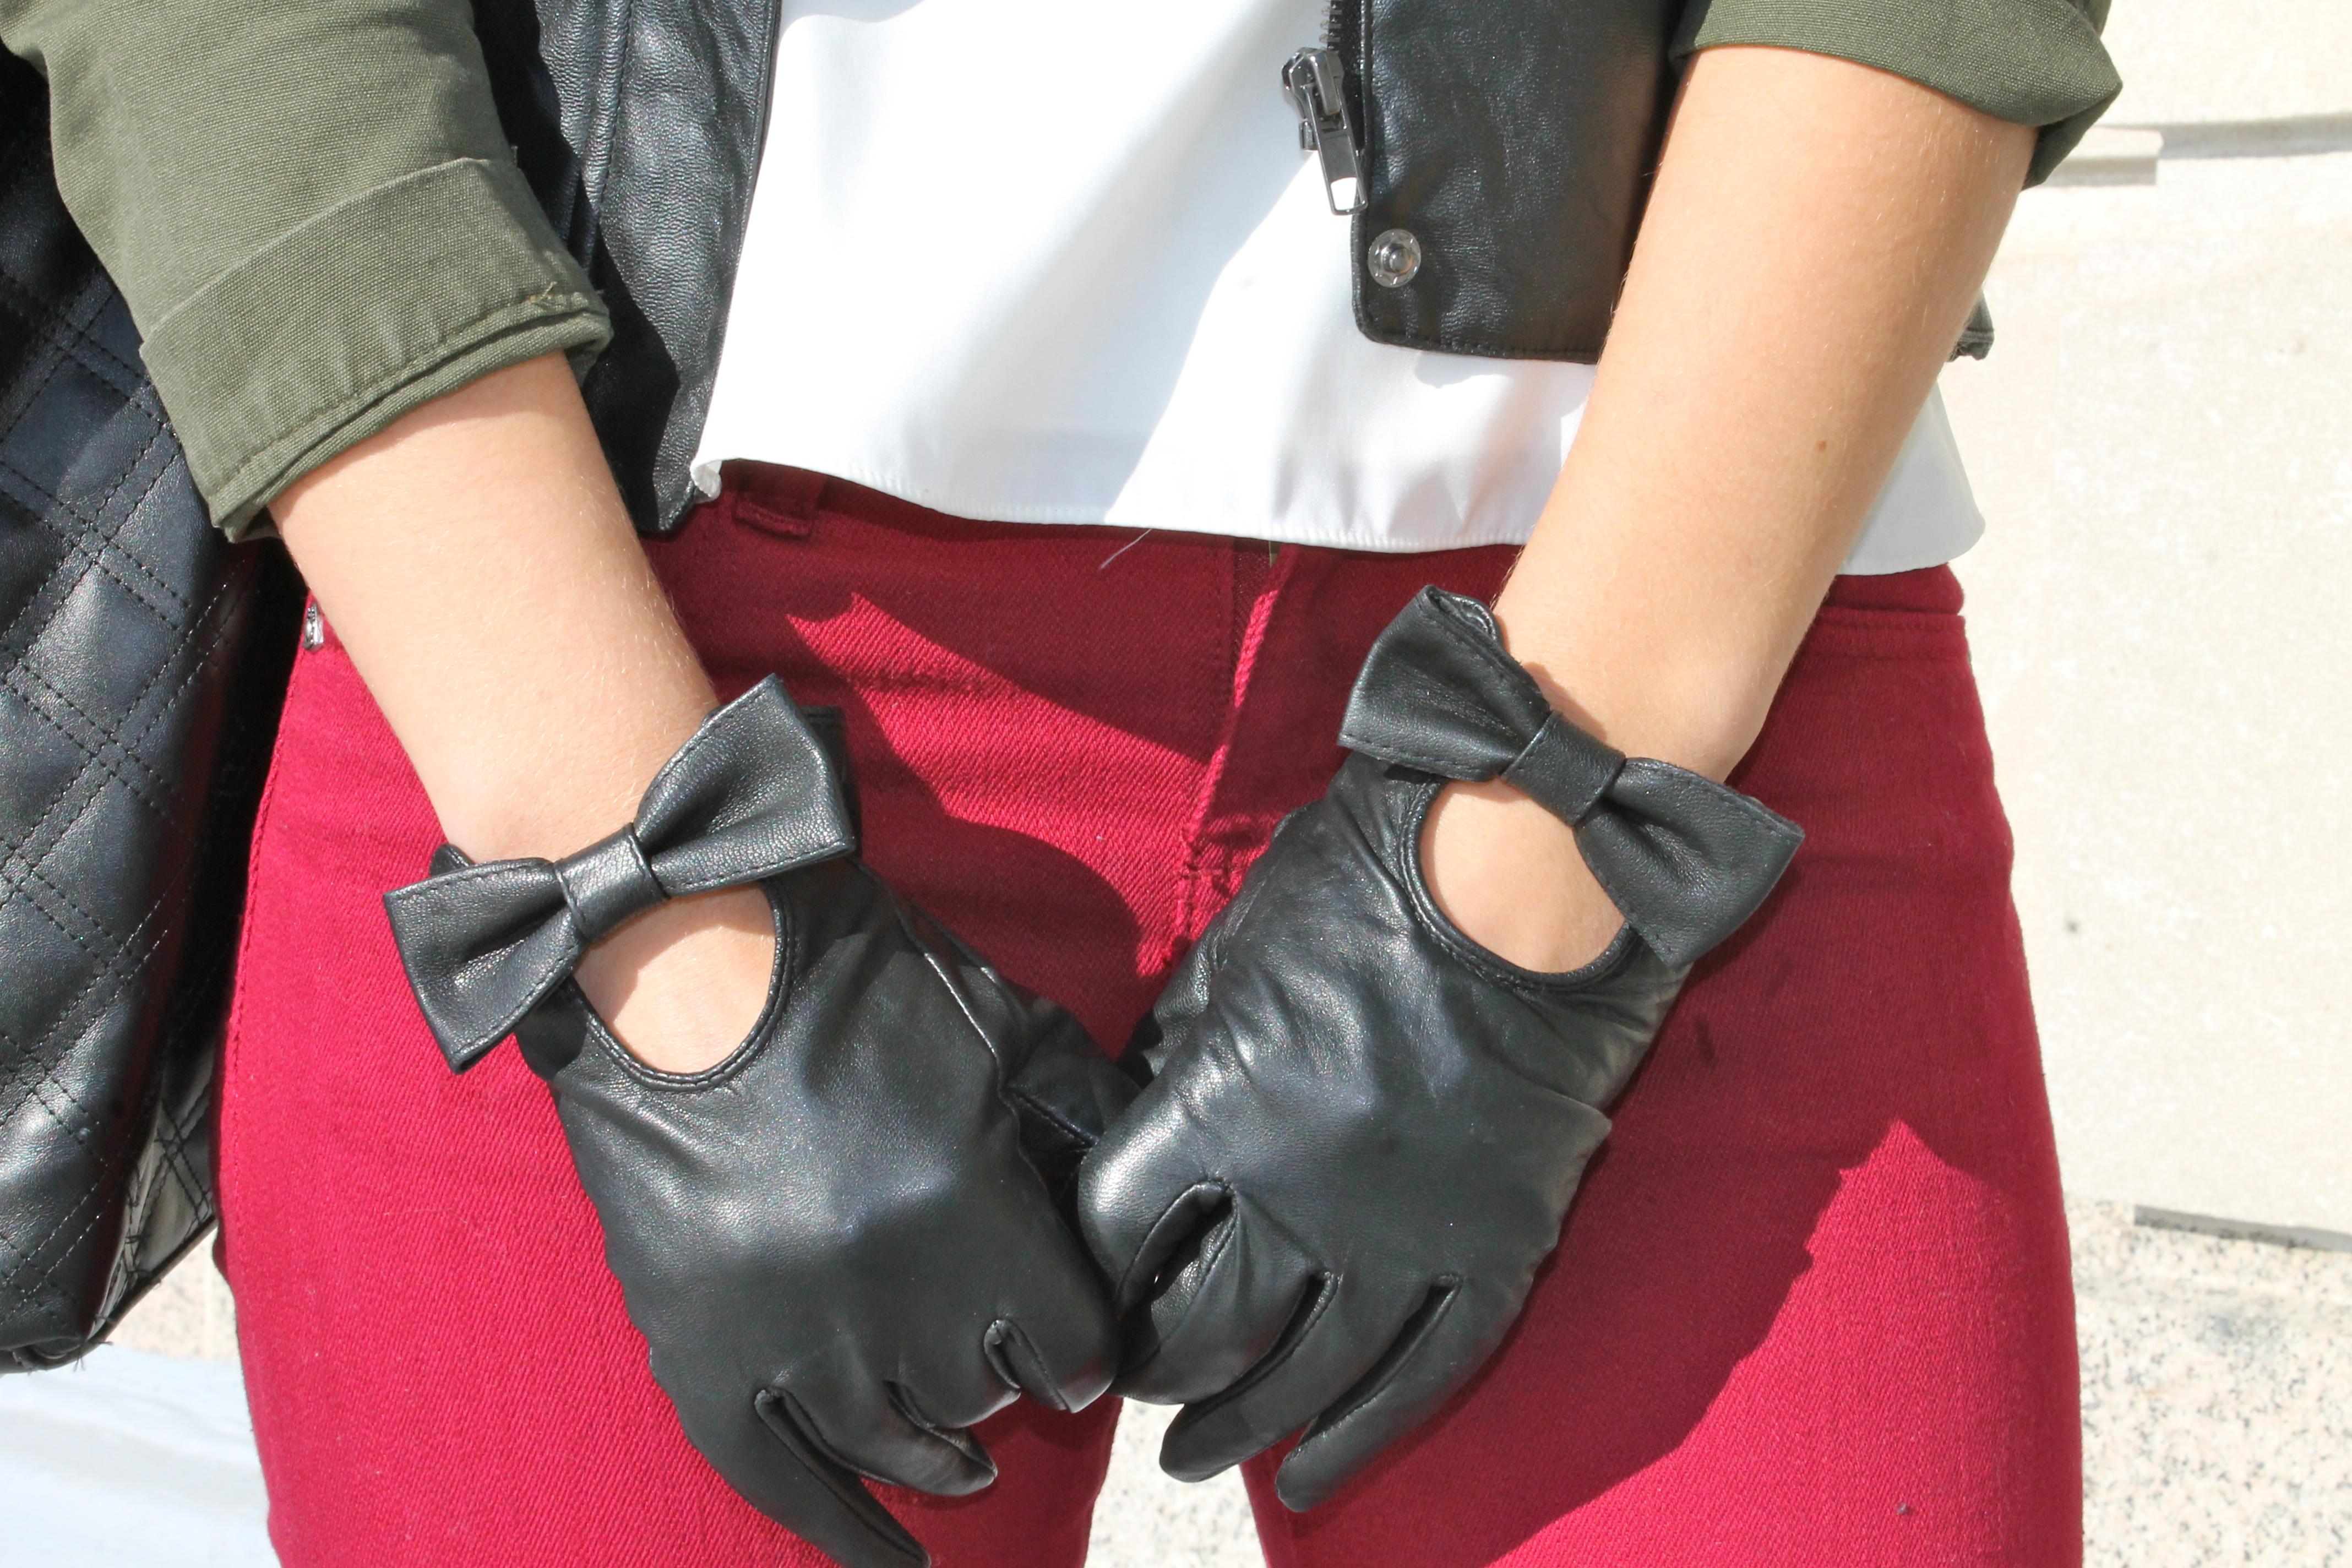 Black gloves at target - Img_3963 Img_3976 Img_3993 Img_3997 Img_4015 Img_4026 Img_4027 Img_4005